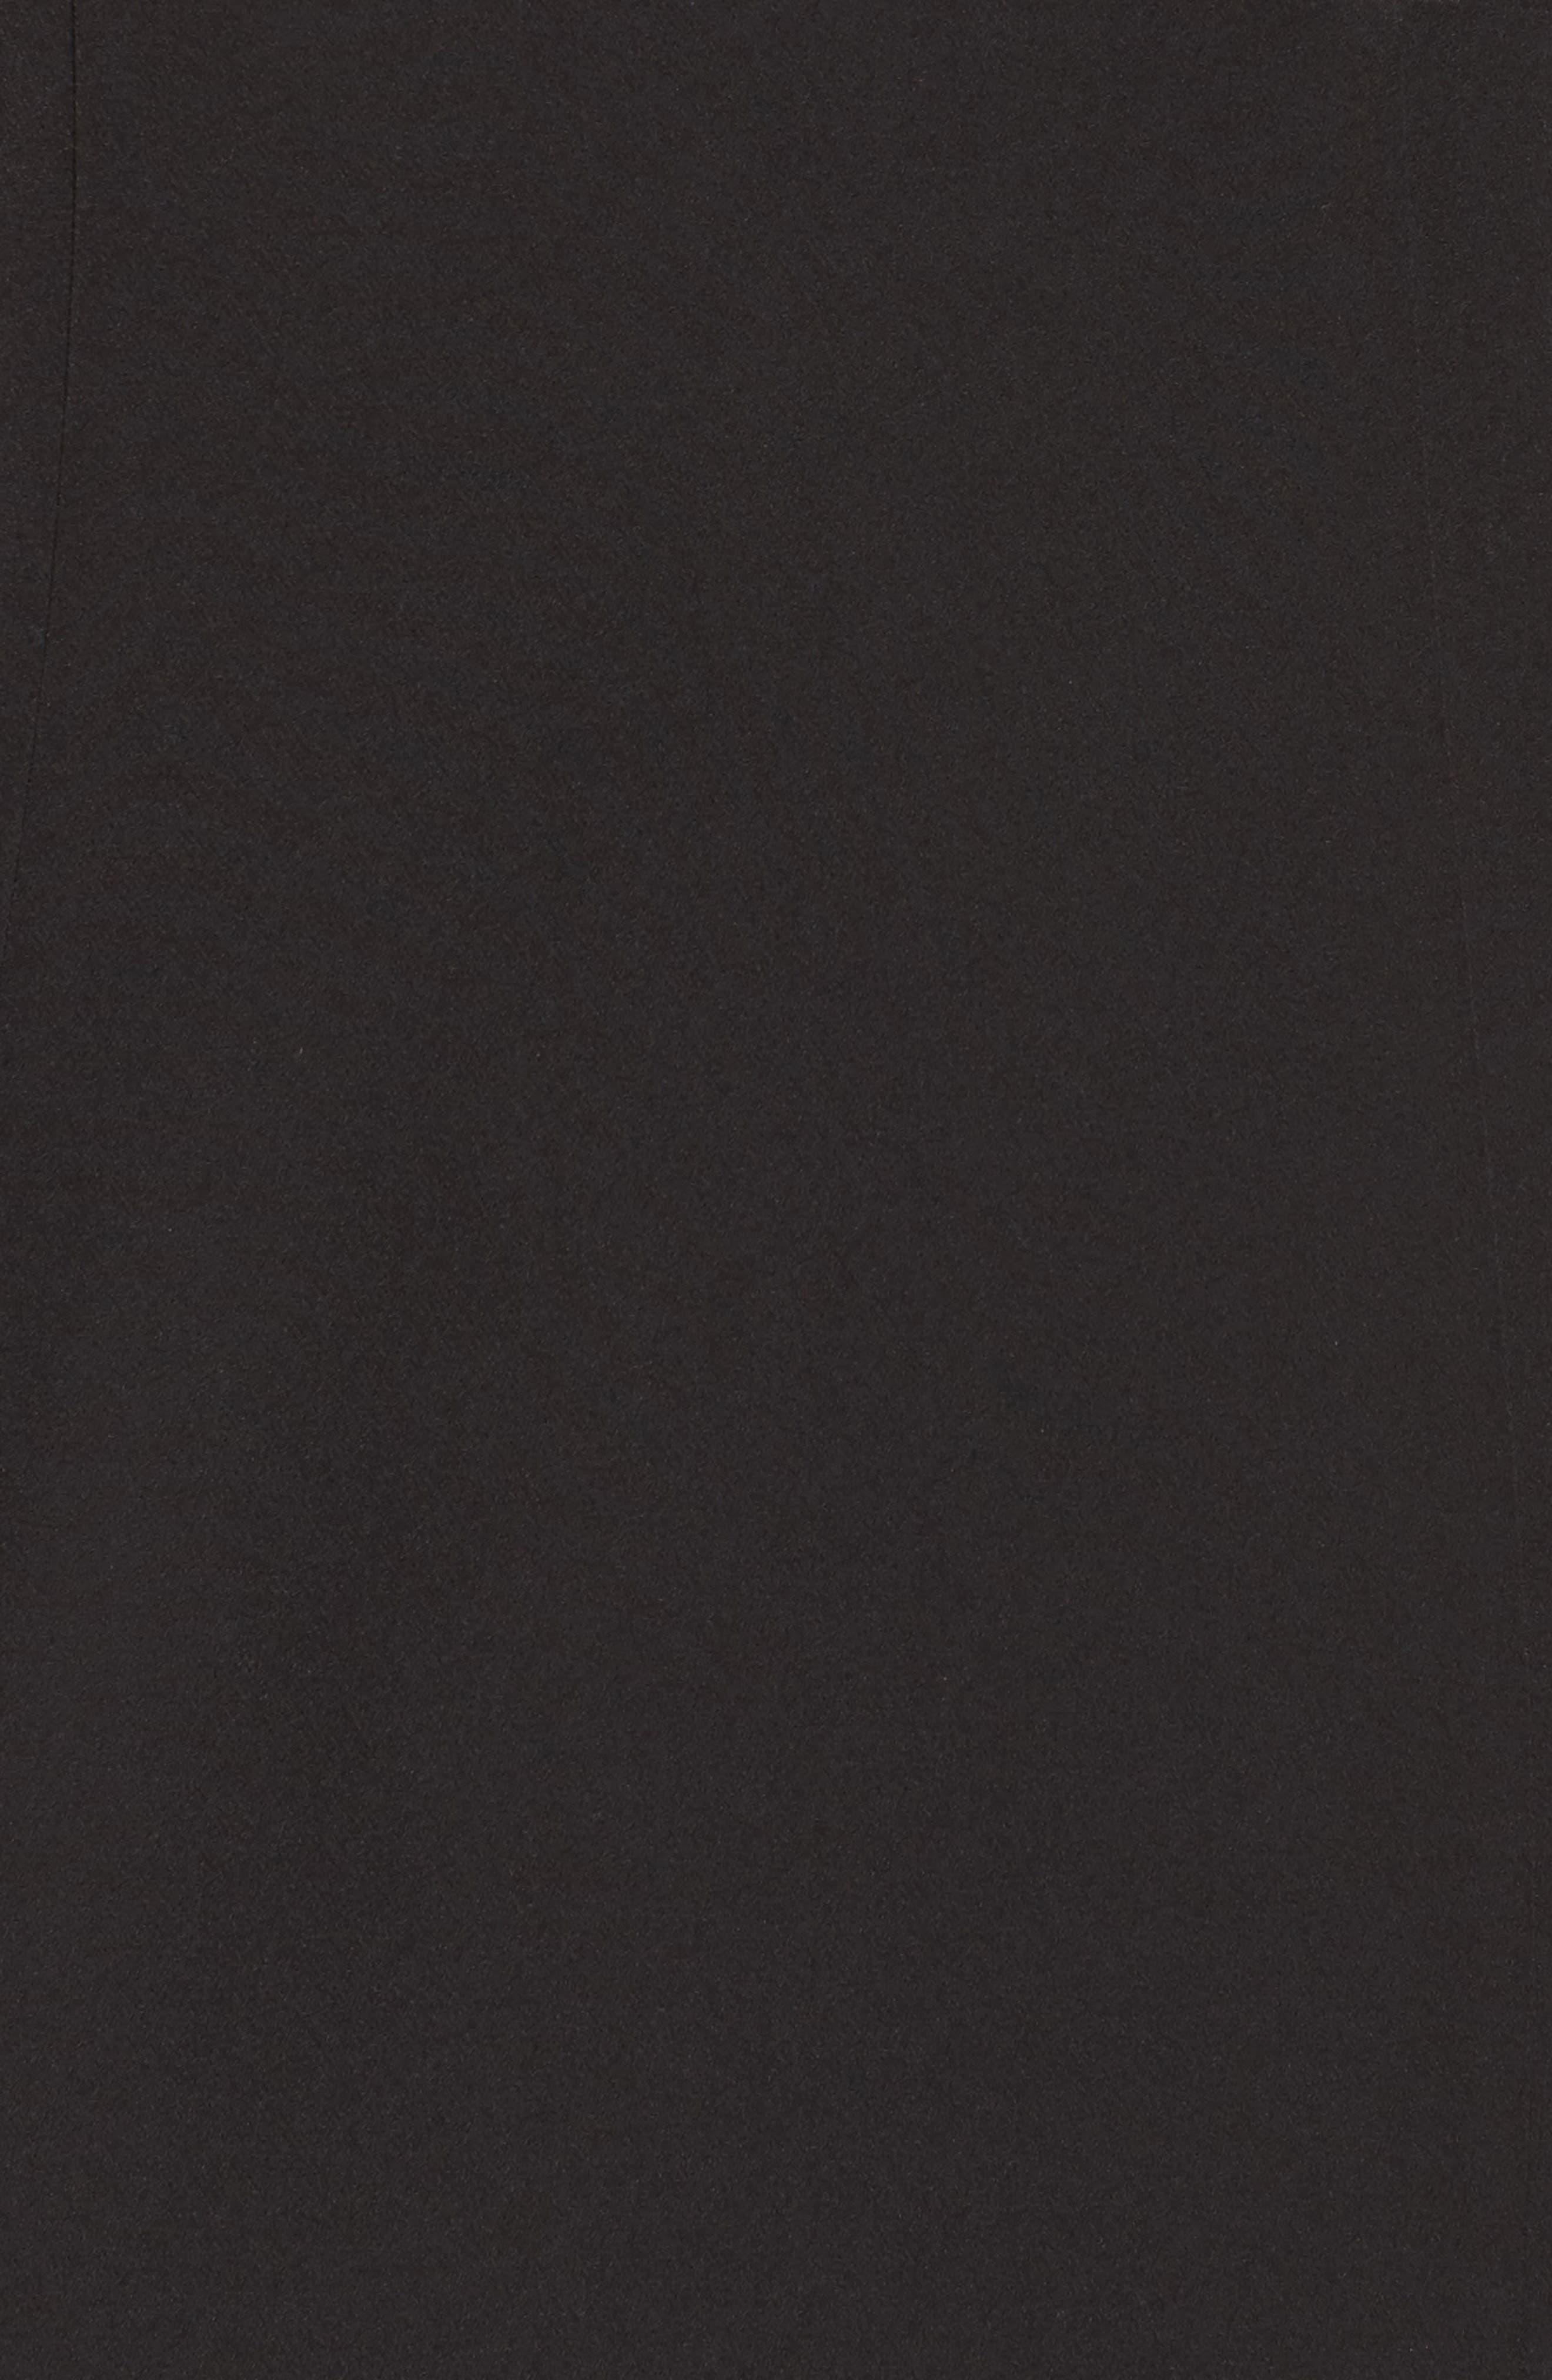 One-Shoulder Ruffle Sheath Dress,                             Alternate thumbnail 9, color,